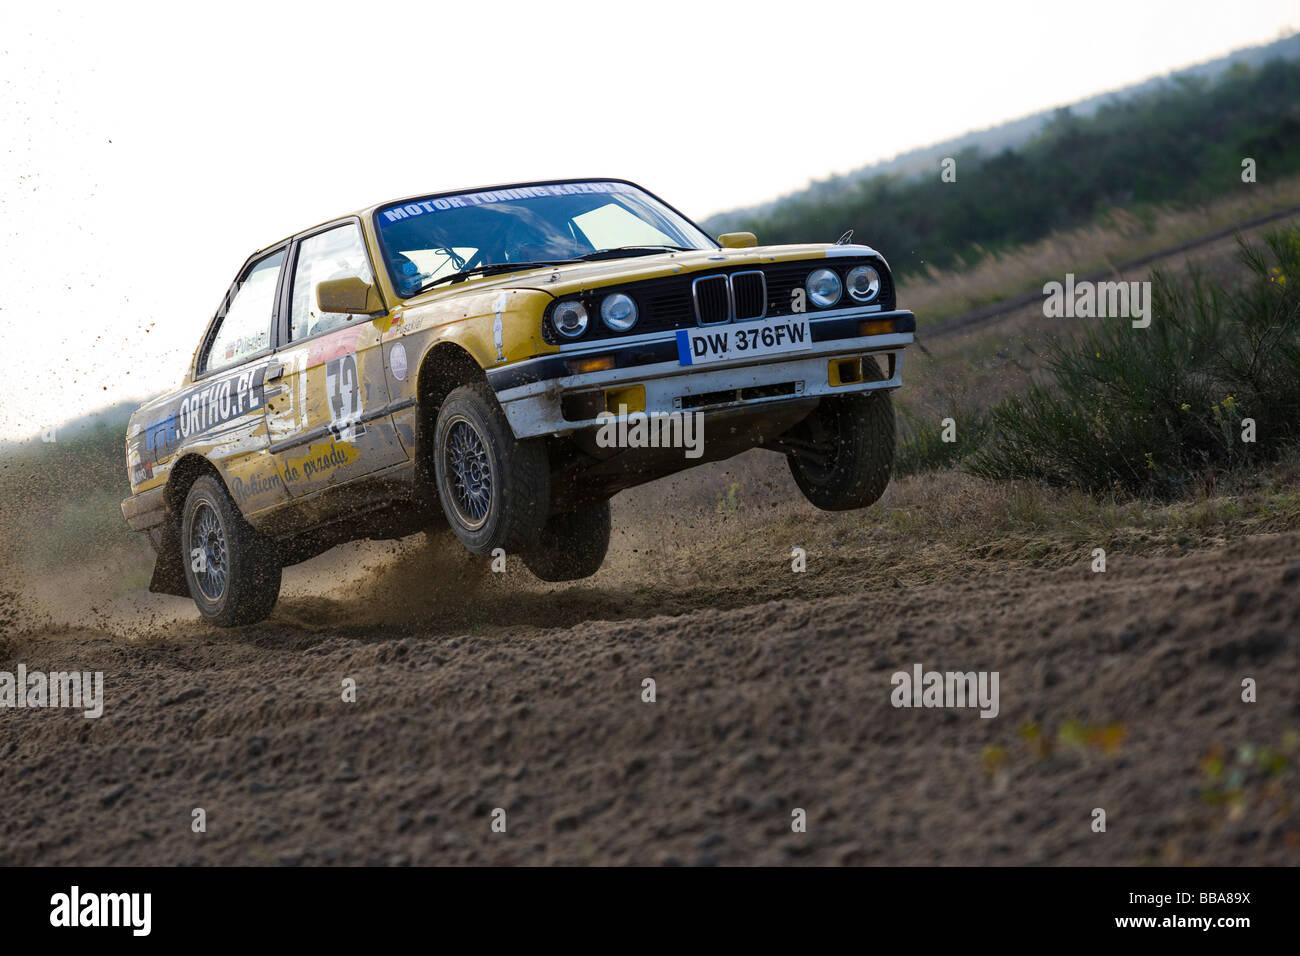 Bmw 318is Jumping, Lausitz Rallye, Motorsport, Sachsen, Deutschland, Europa Stockbild